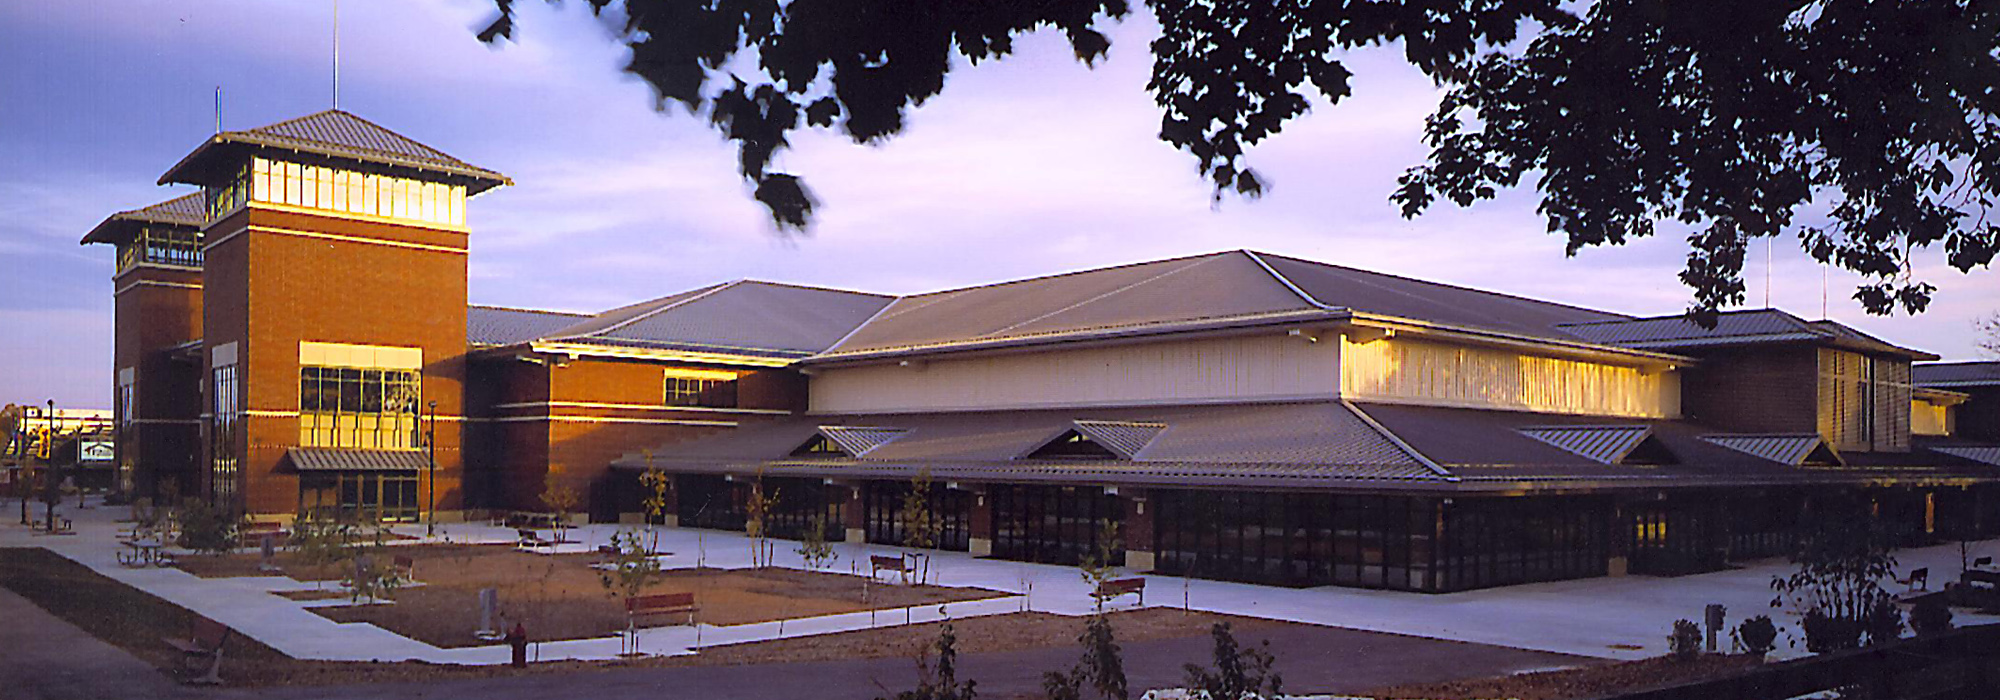 Wisconsin Exposition Center